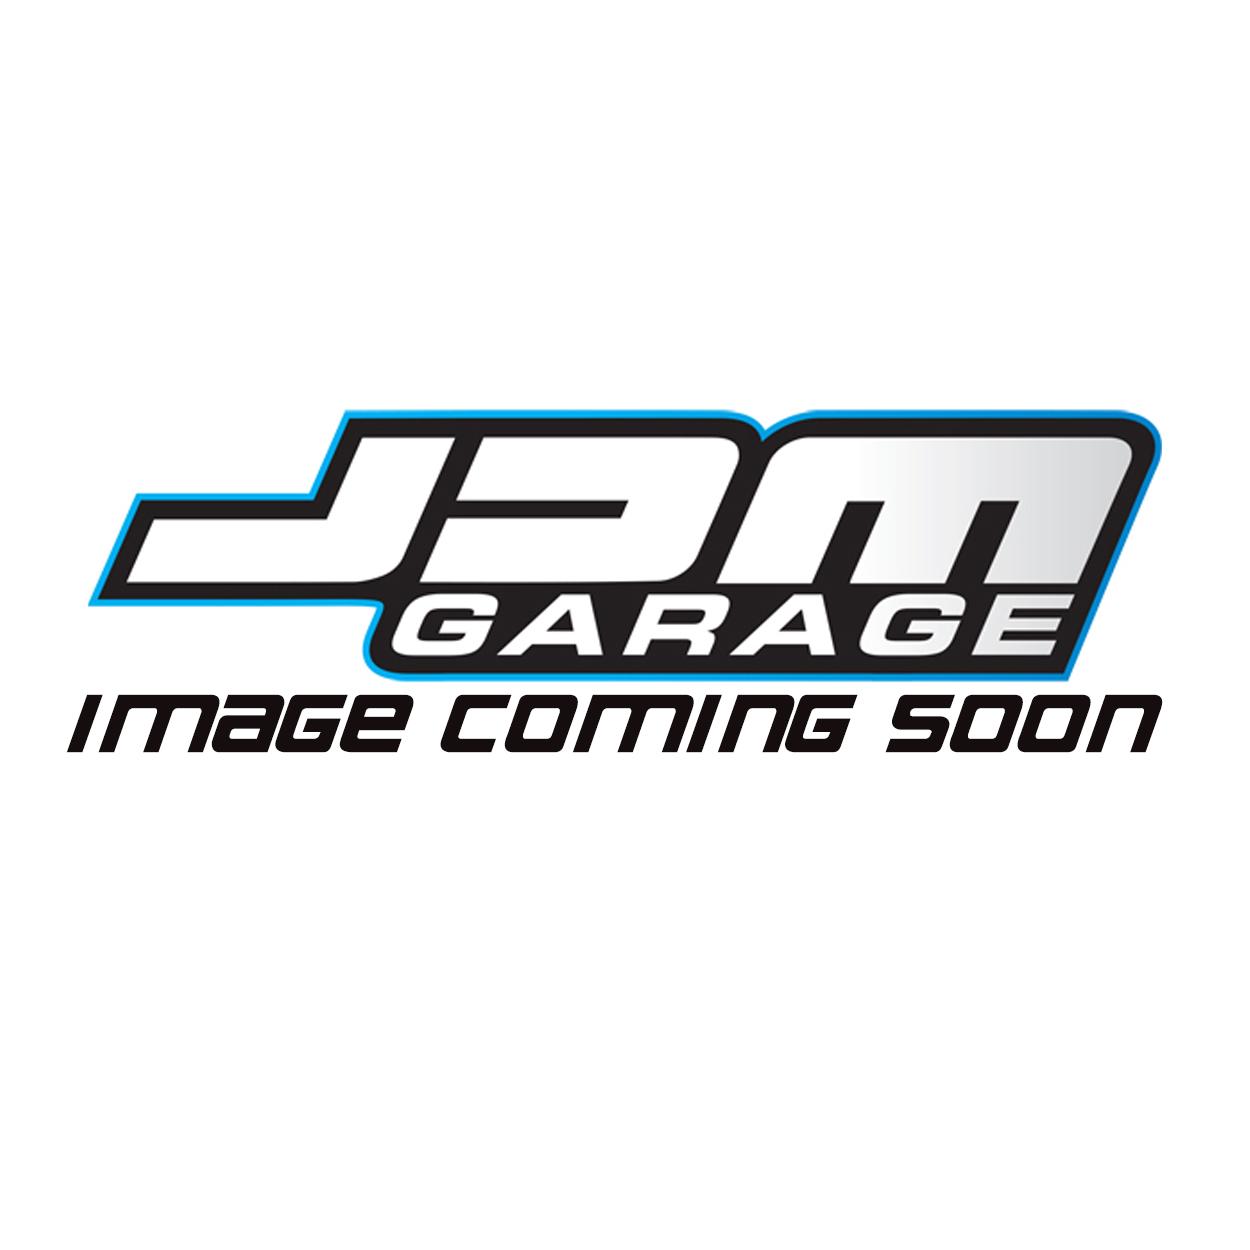 OE Replacement & EBC Greenstuff / Yellowstuff Front Brake Pads - Mazda MX5 Mk2 NB 98-05